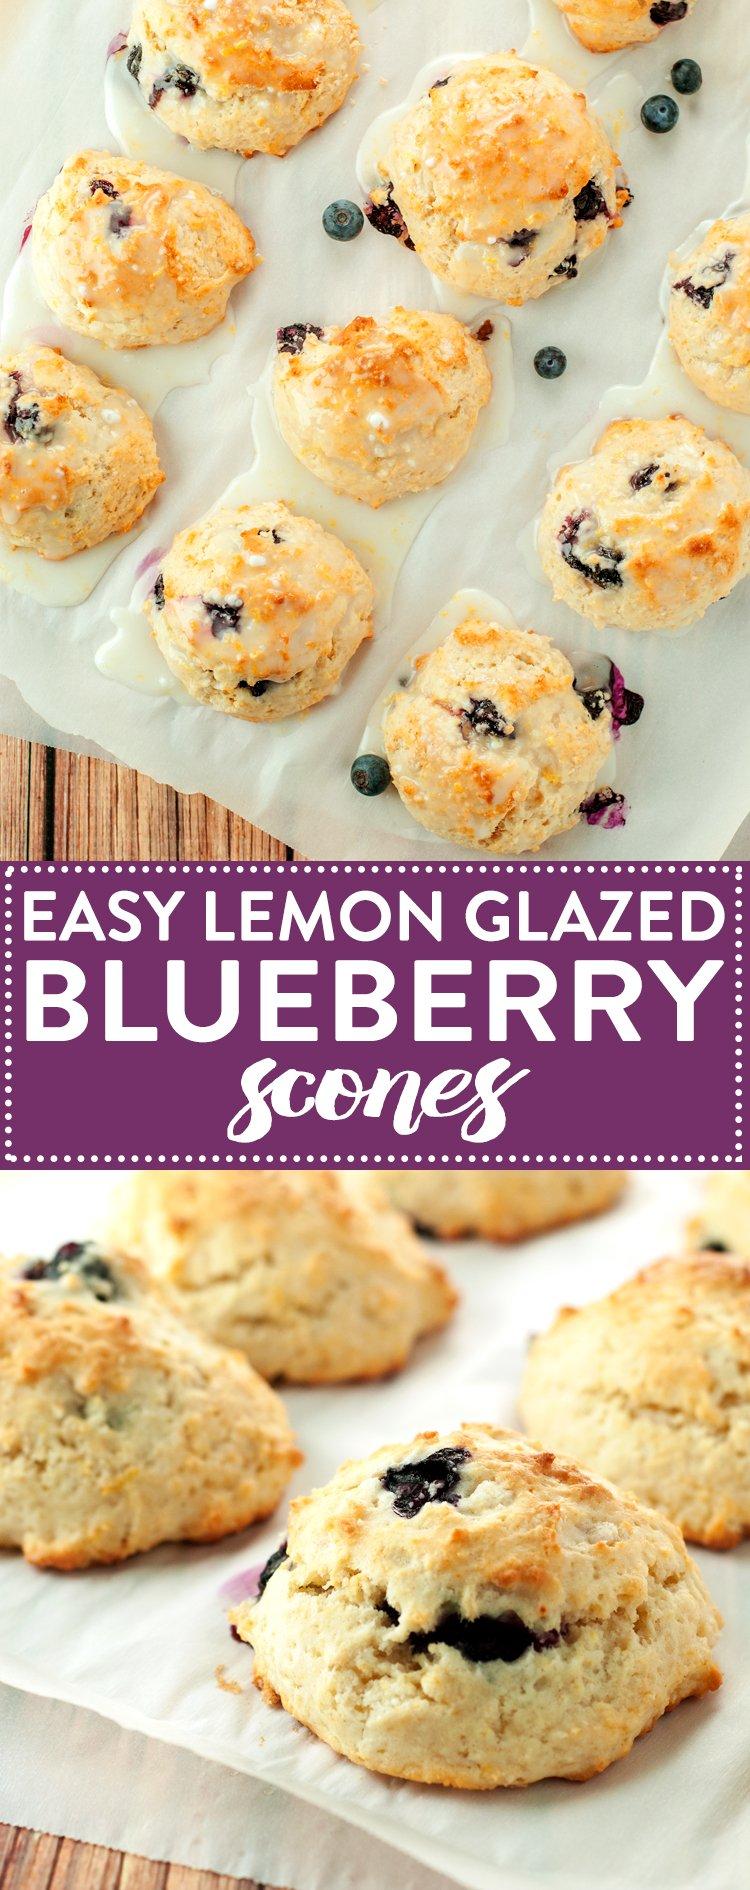 Easy Lemon Glazed Blueberry Scones   asimplepantry.com